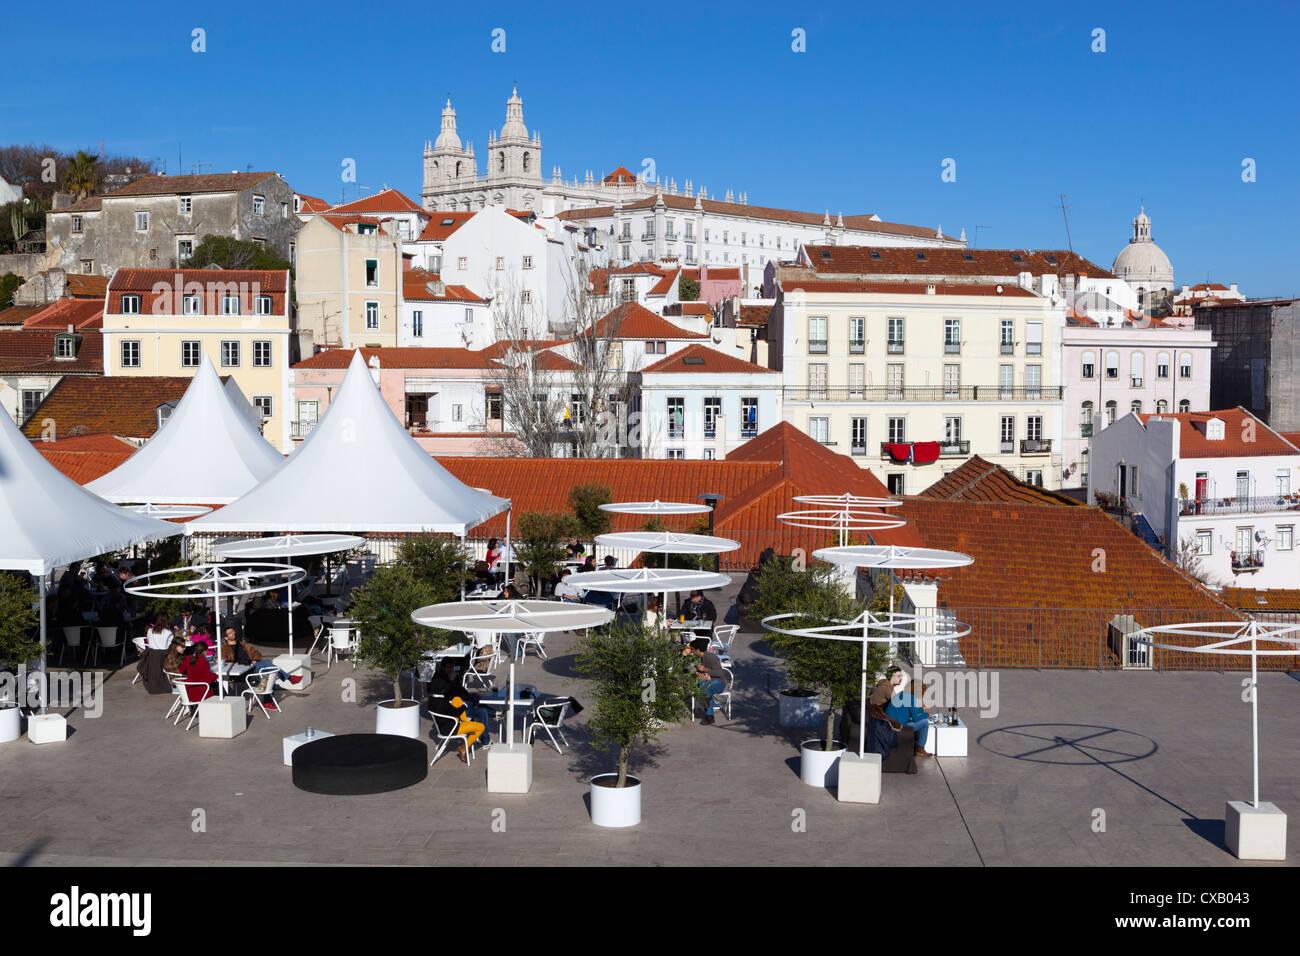 Cafe below Miradouro das Portas do Sol, Alfama, Lisbon, Portugal, Europe - Stock Image